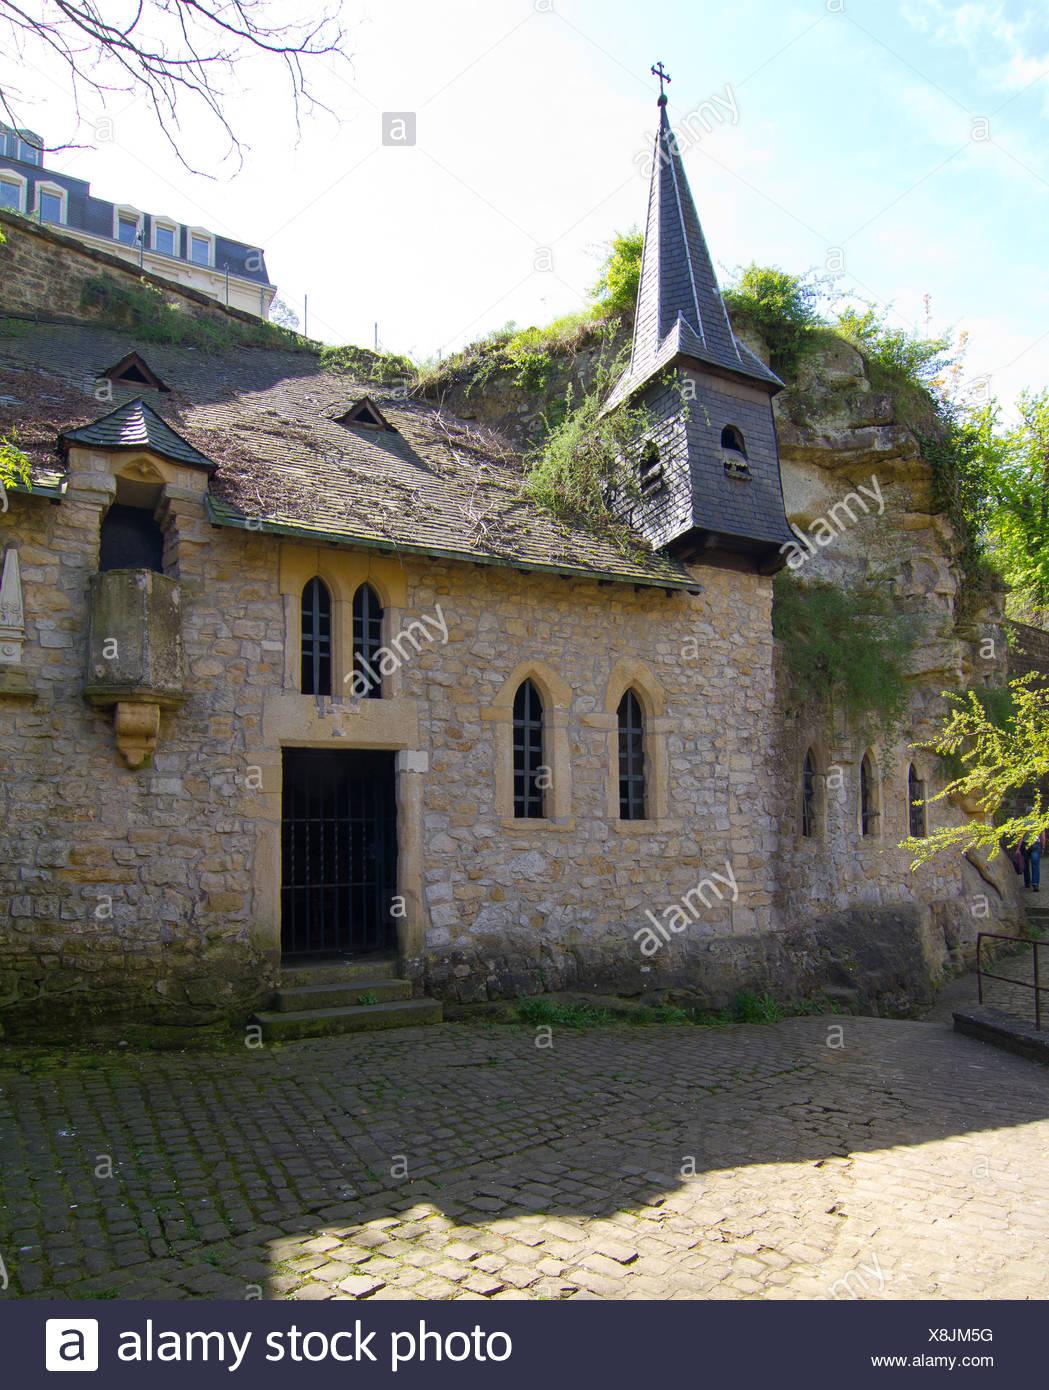 luxembourg 950 Stock Photo